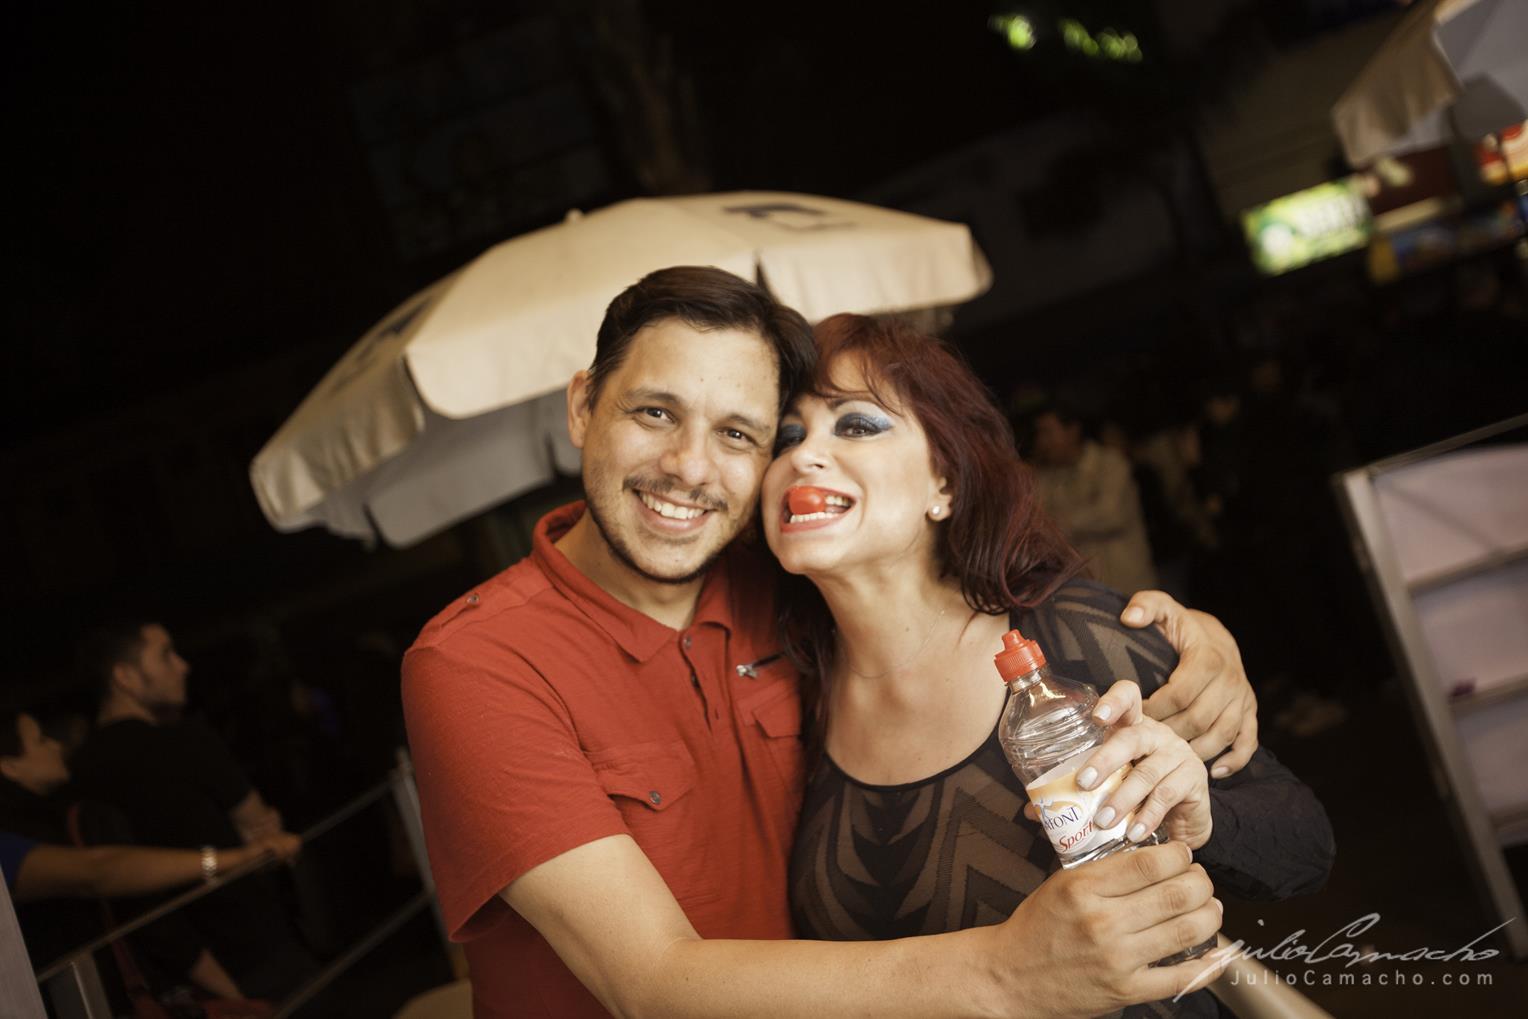 2014-10-30 31 CAST TOUR Ensenada y Tijuana - 1888 - www.Juli (Copy).jpg